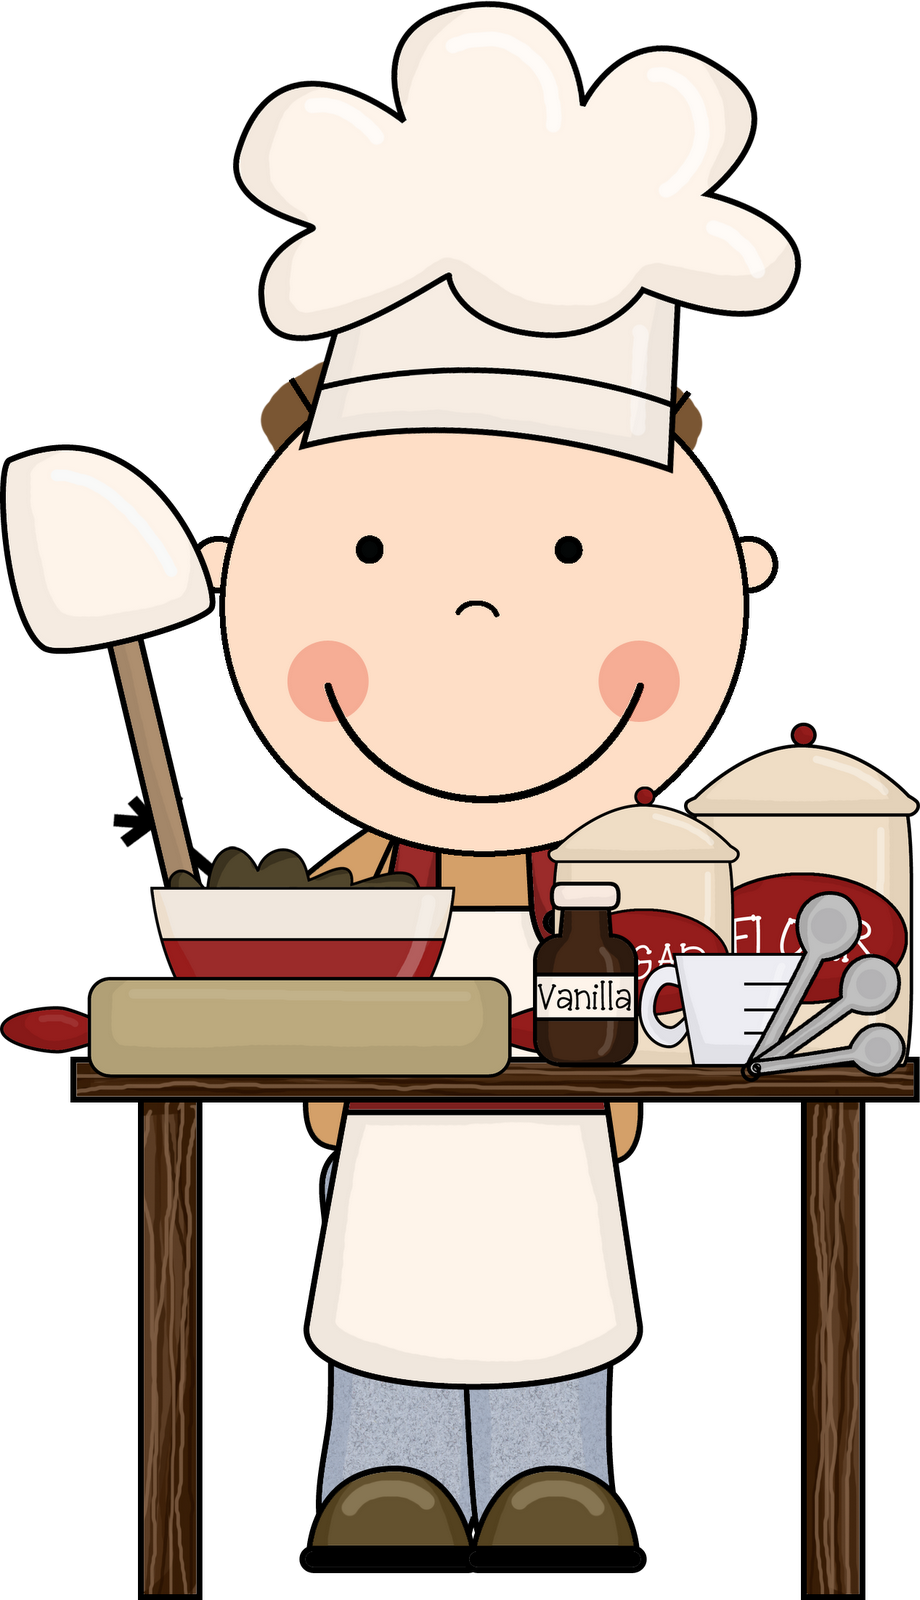 Kids Cooking Clipart Free .-Kids Cooking Clipart Free .-5